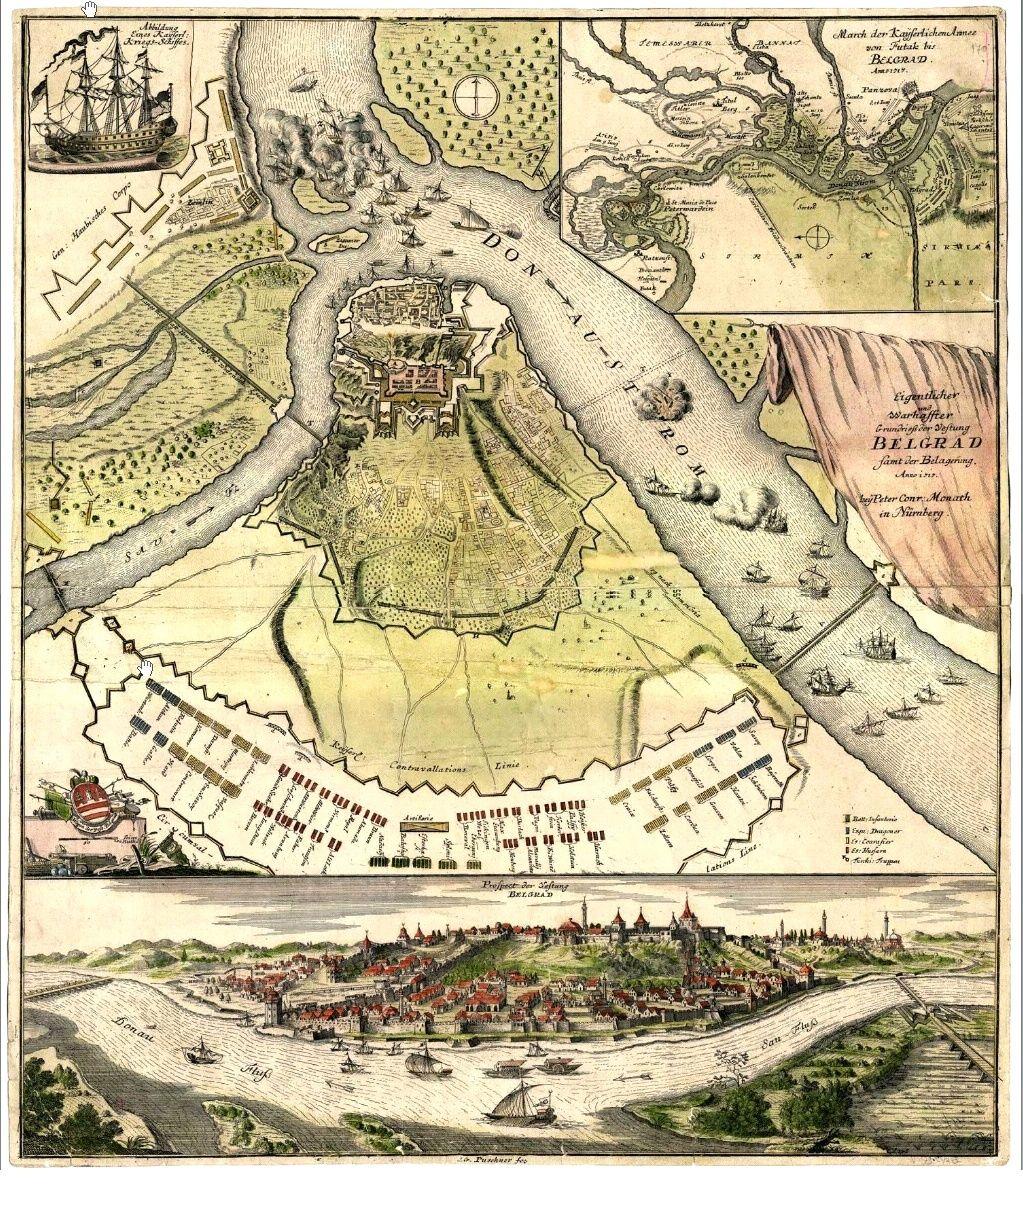 bing mapa beograda Beograd, Mapa iz 1717. | Belgrade, 1717 map | History | Pinterest  bing mapa beograda